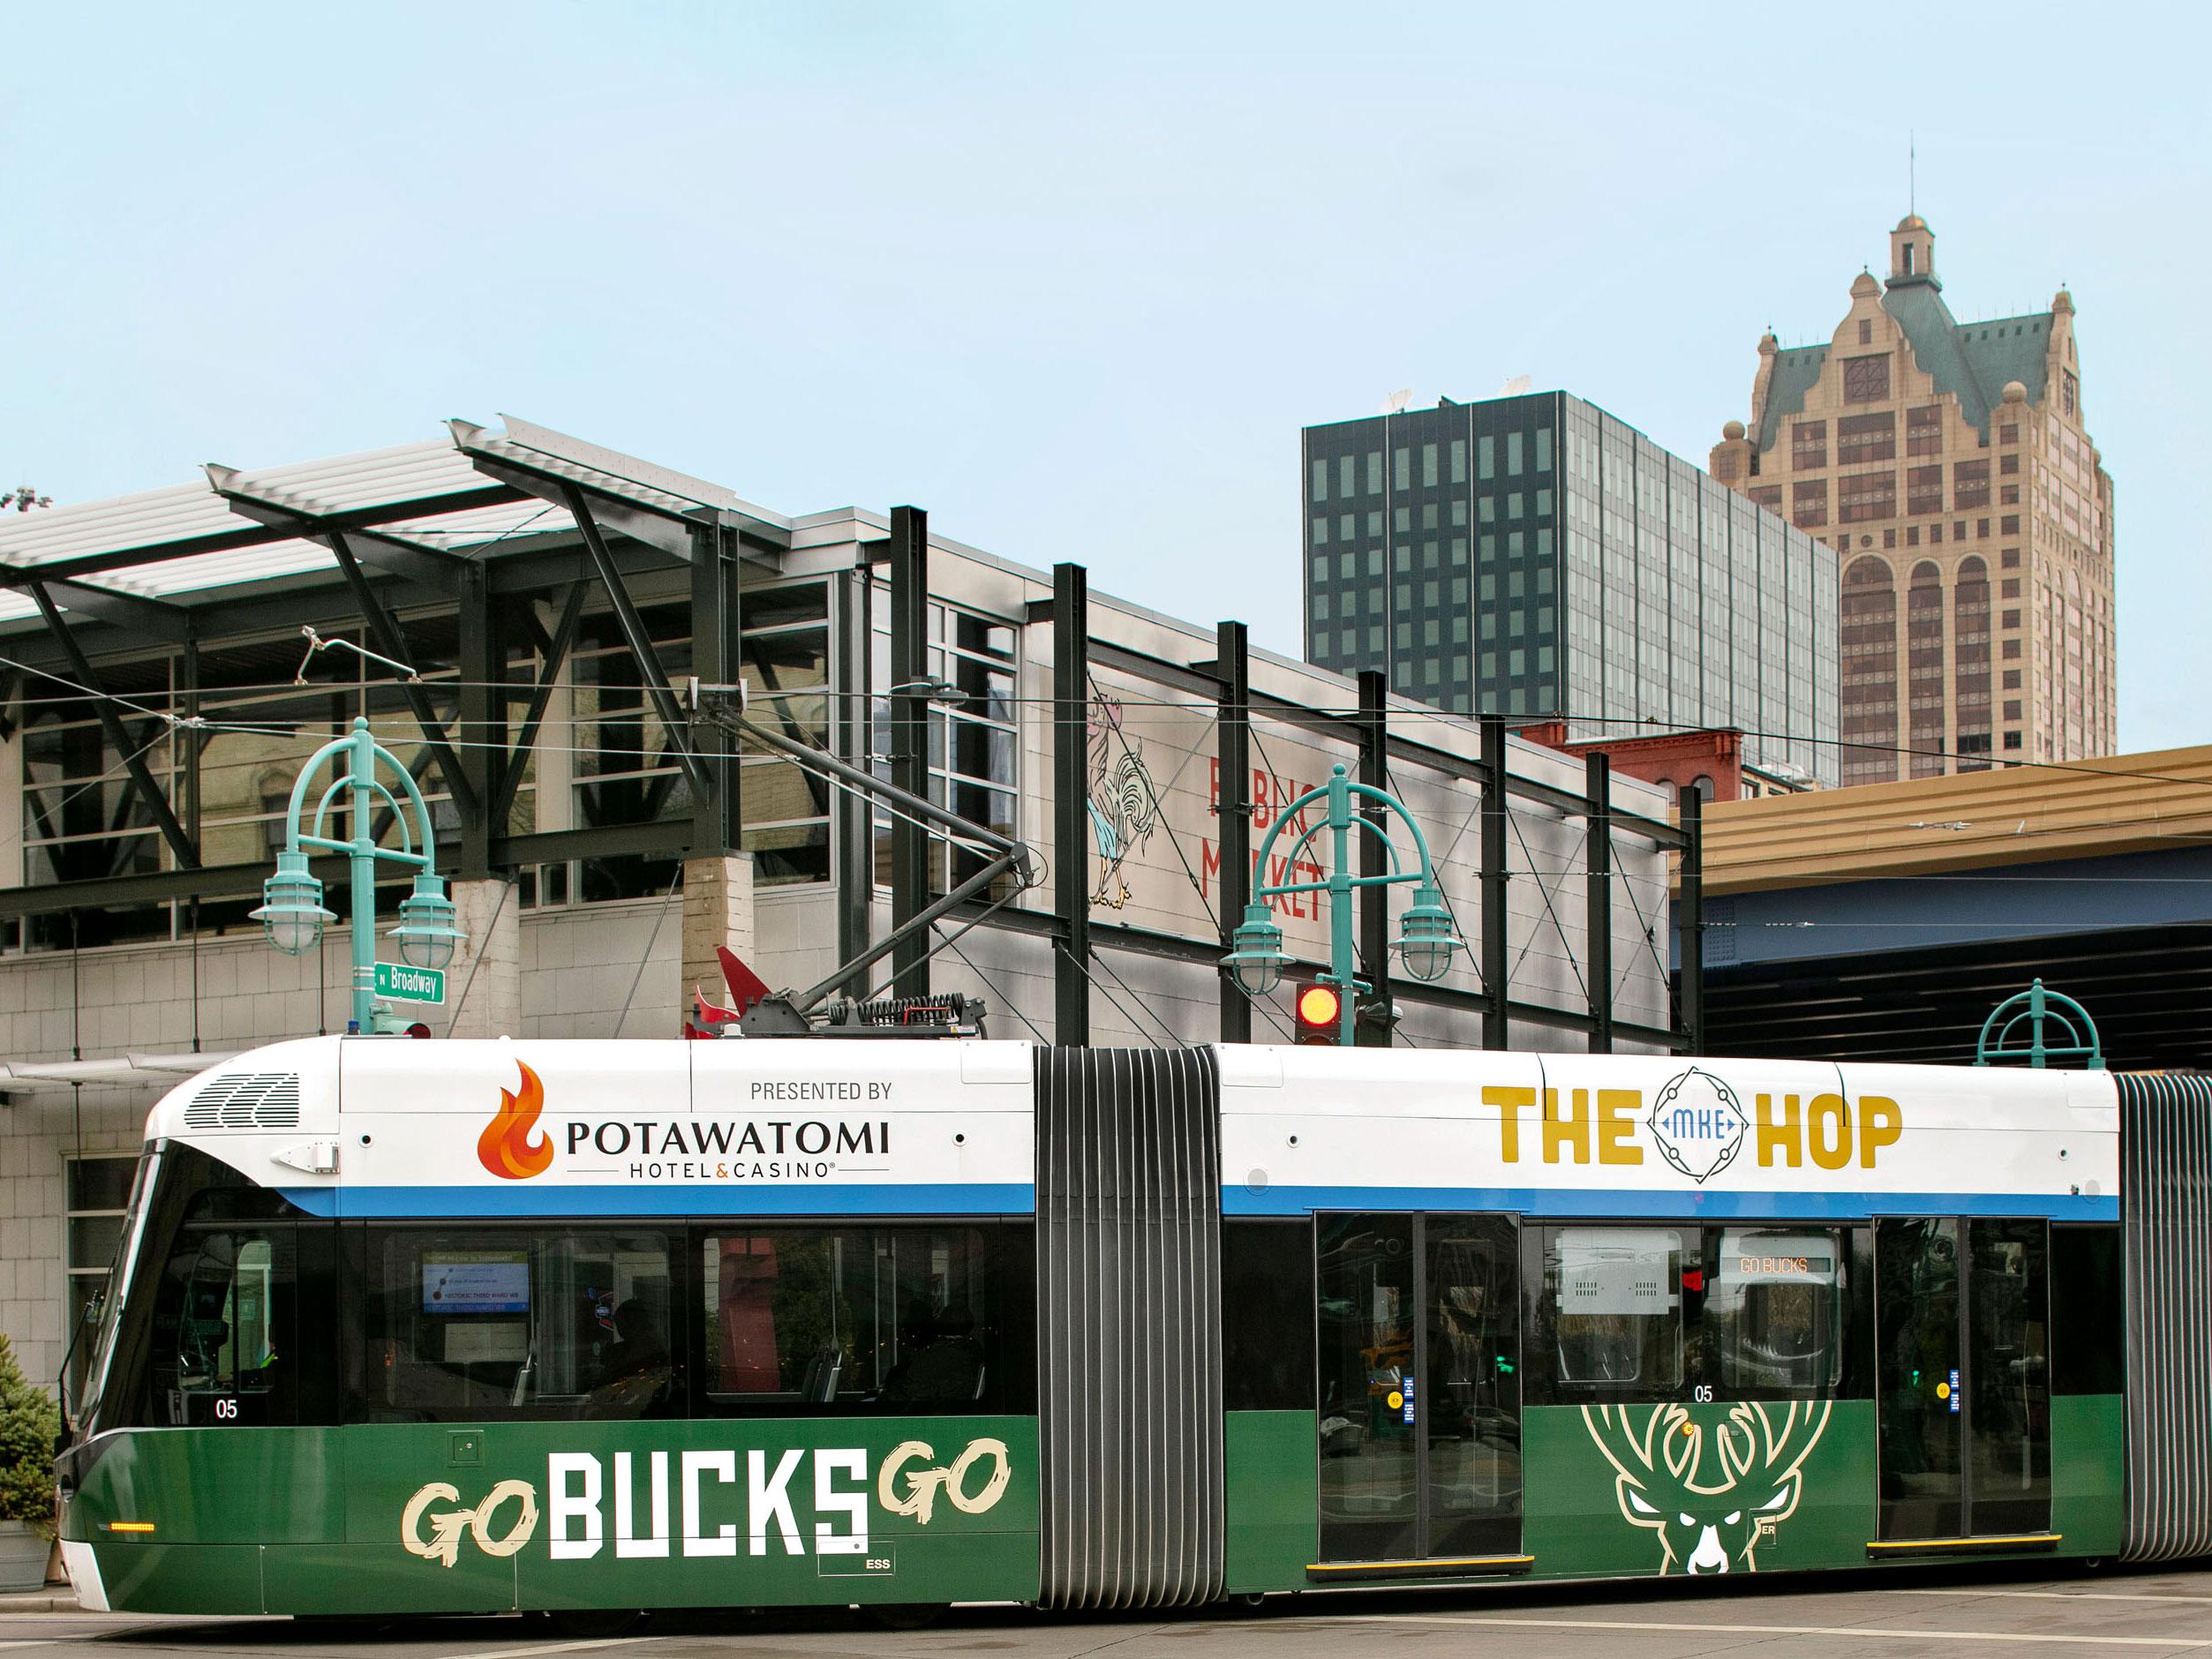 The Hop Streetcar